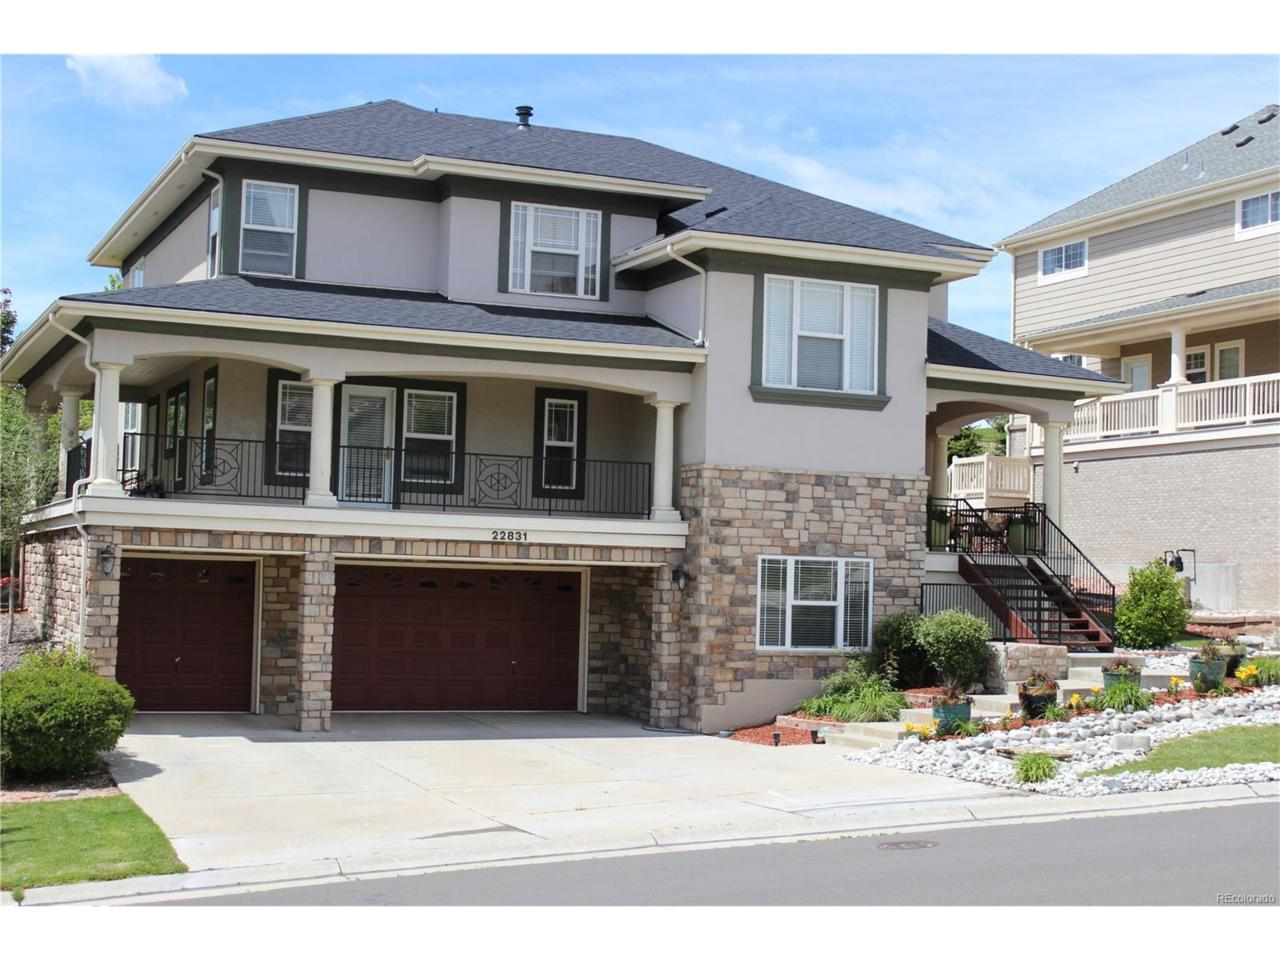 22831 E Euclid Circle, Aurora, CO 80016 (MLS #4050630) :: 8z Real Estate